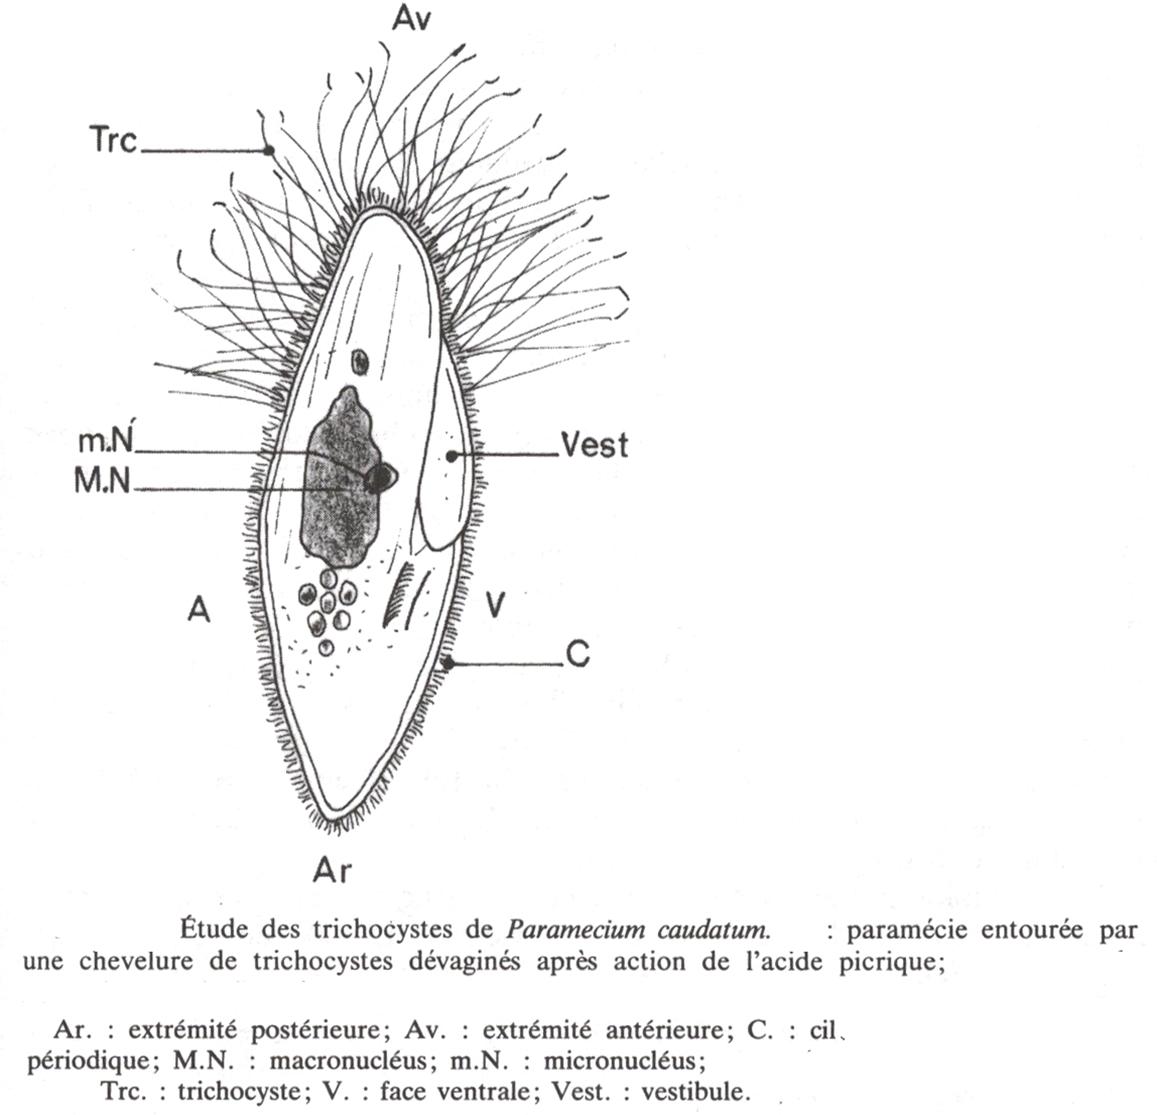 Trichocyste